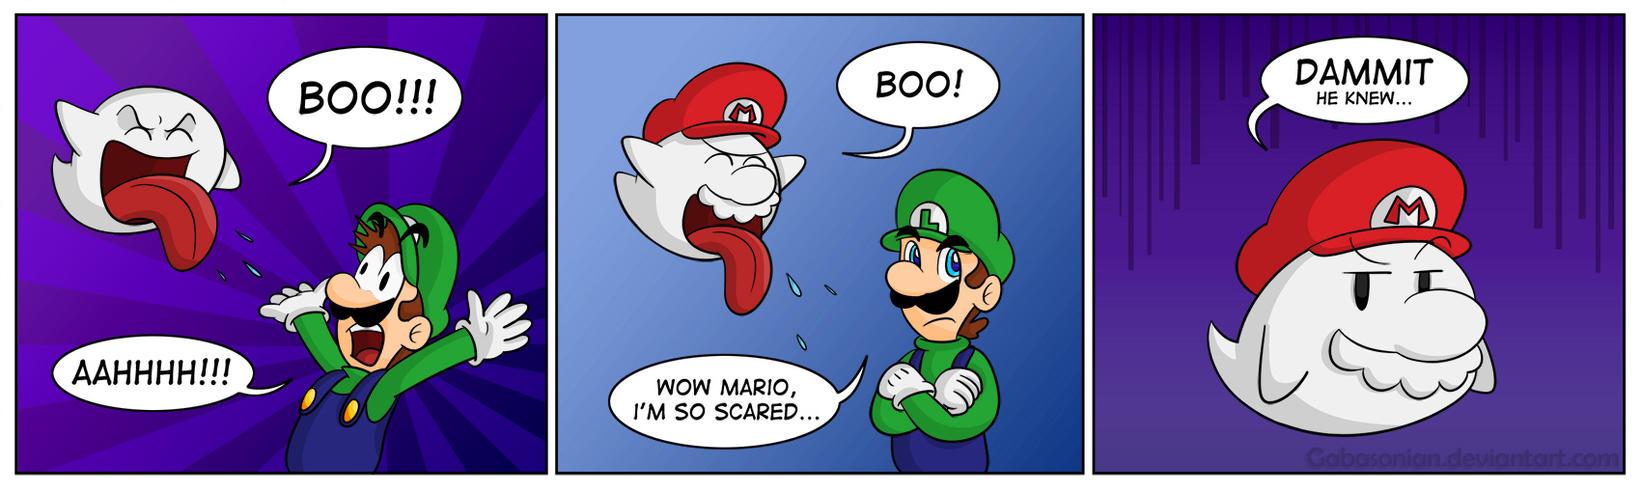 Boo! by Gabasonian